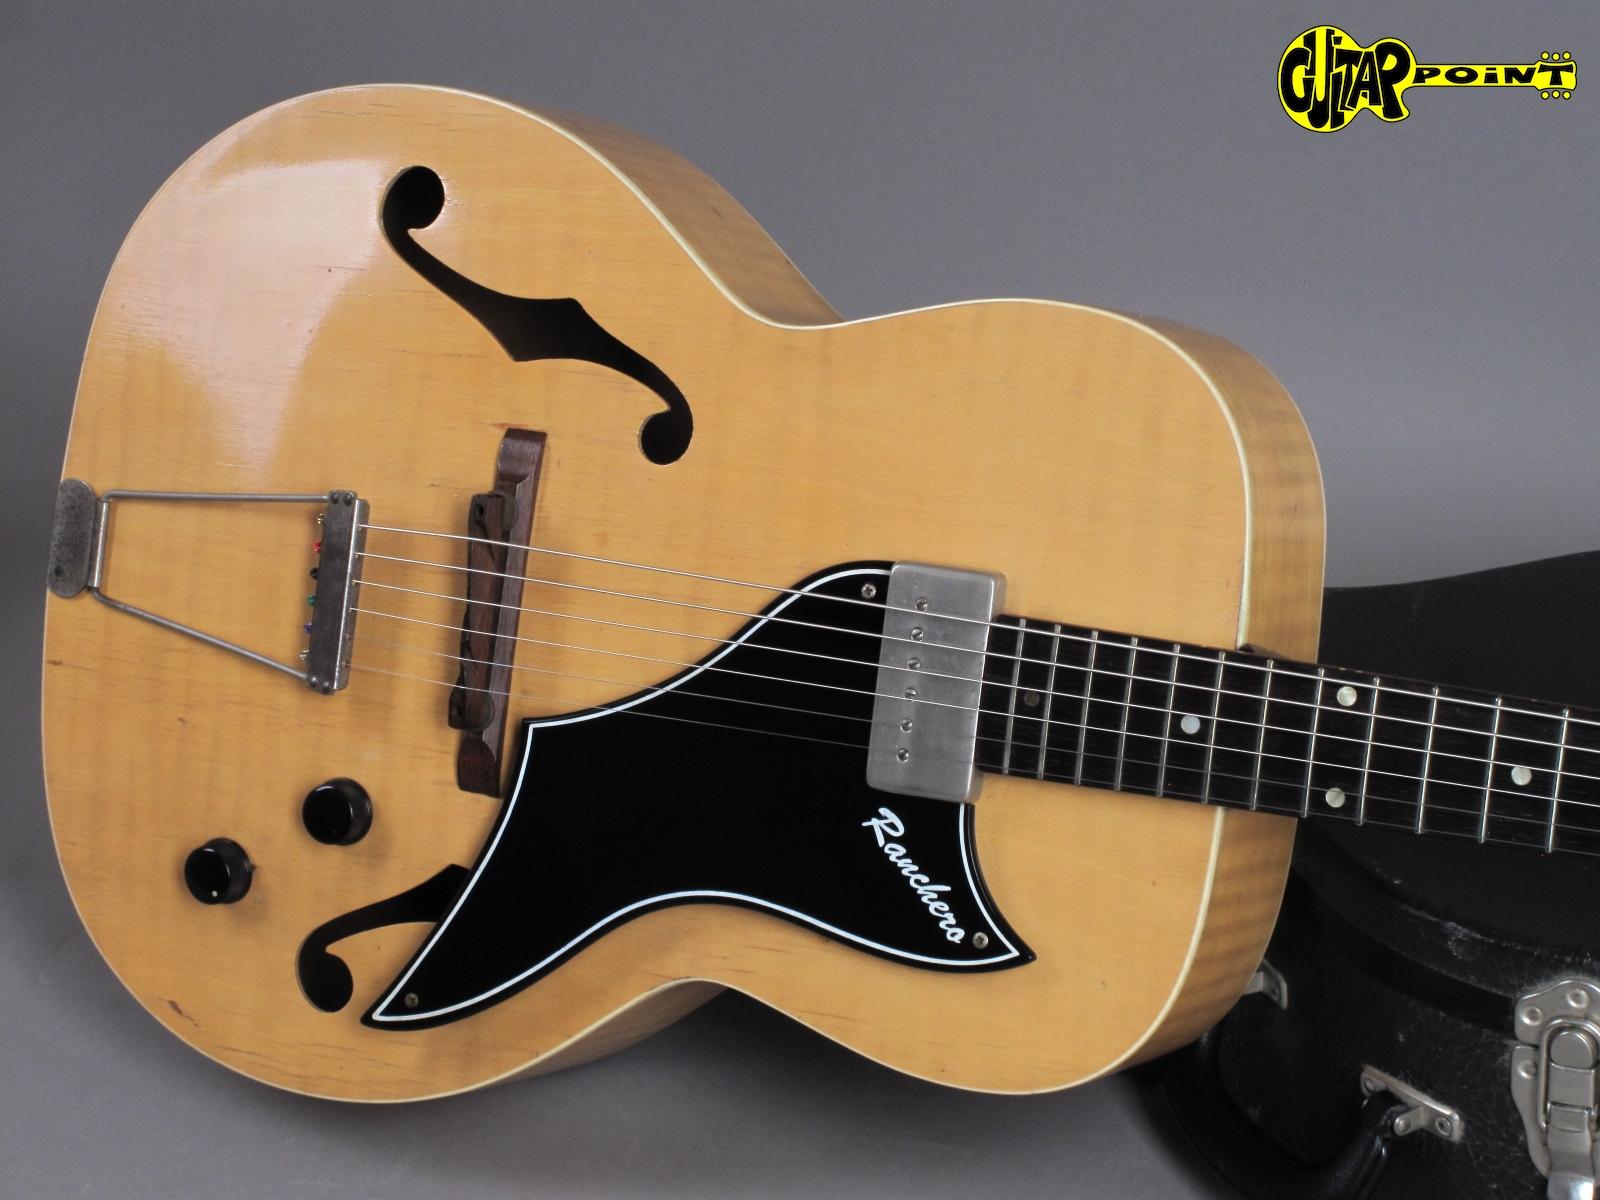 https://guitarpoint.de/app/uploads/products/1956-supro-ranchero-natural/Supro56RancheroNT_X58013_19.jpg